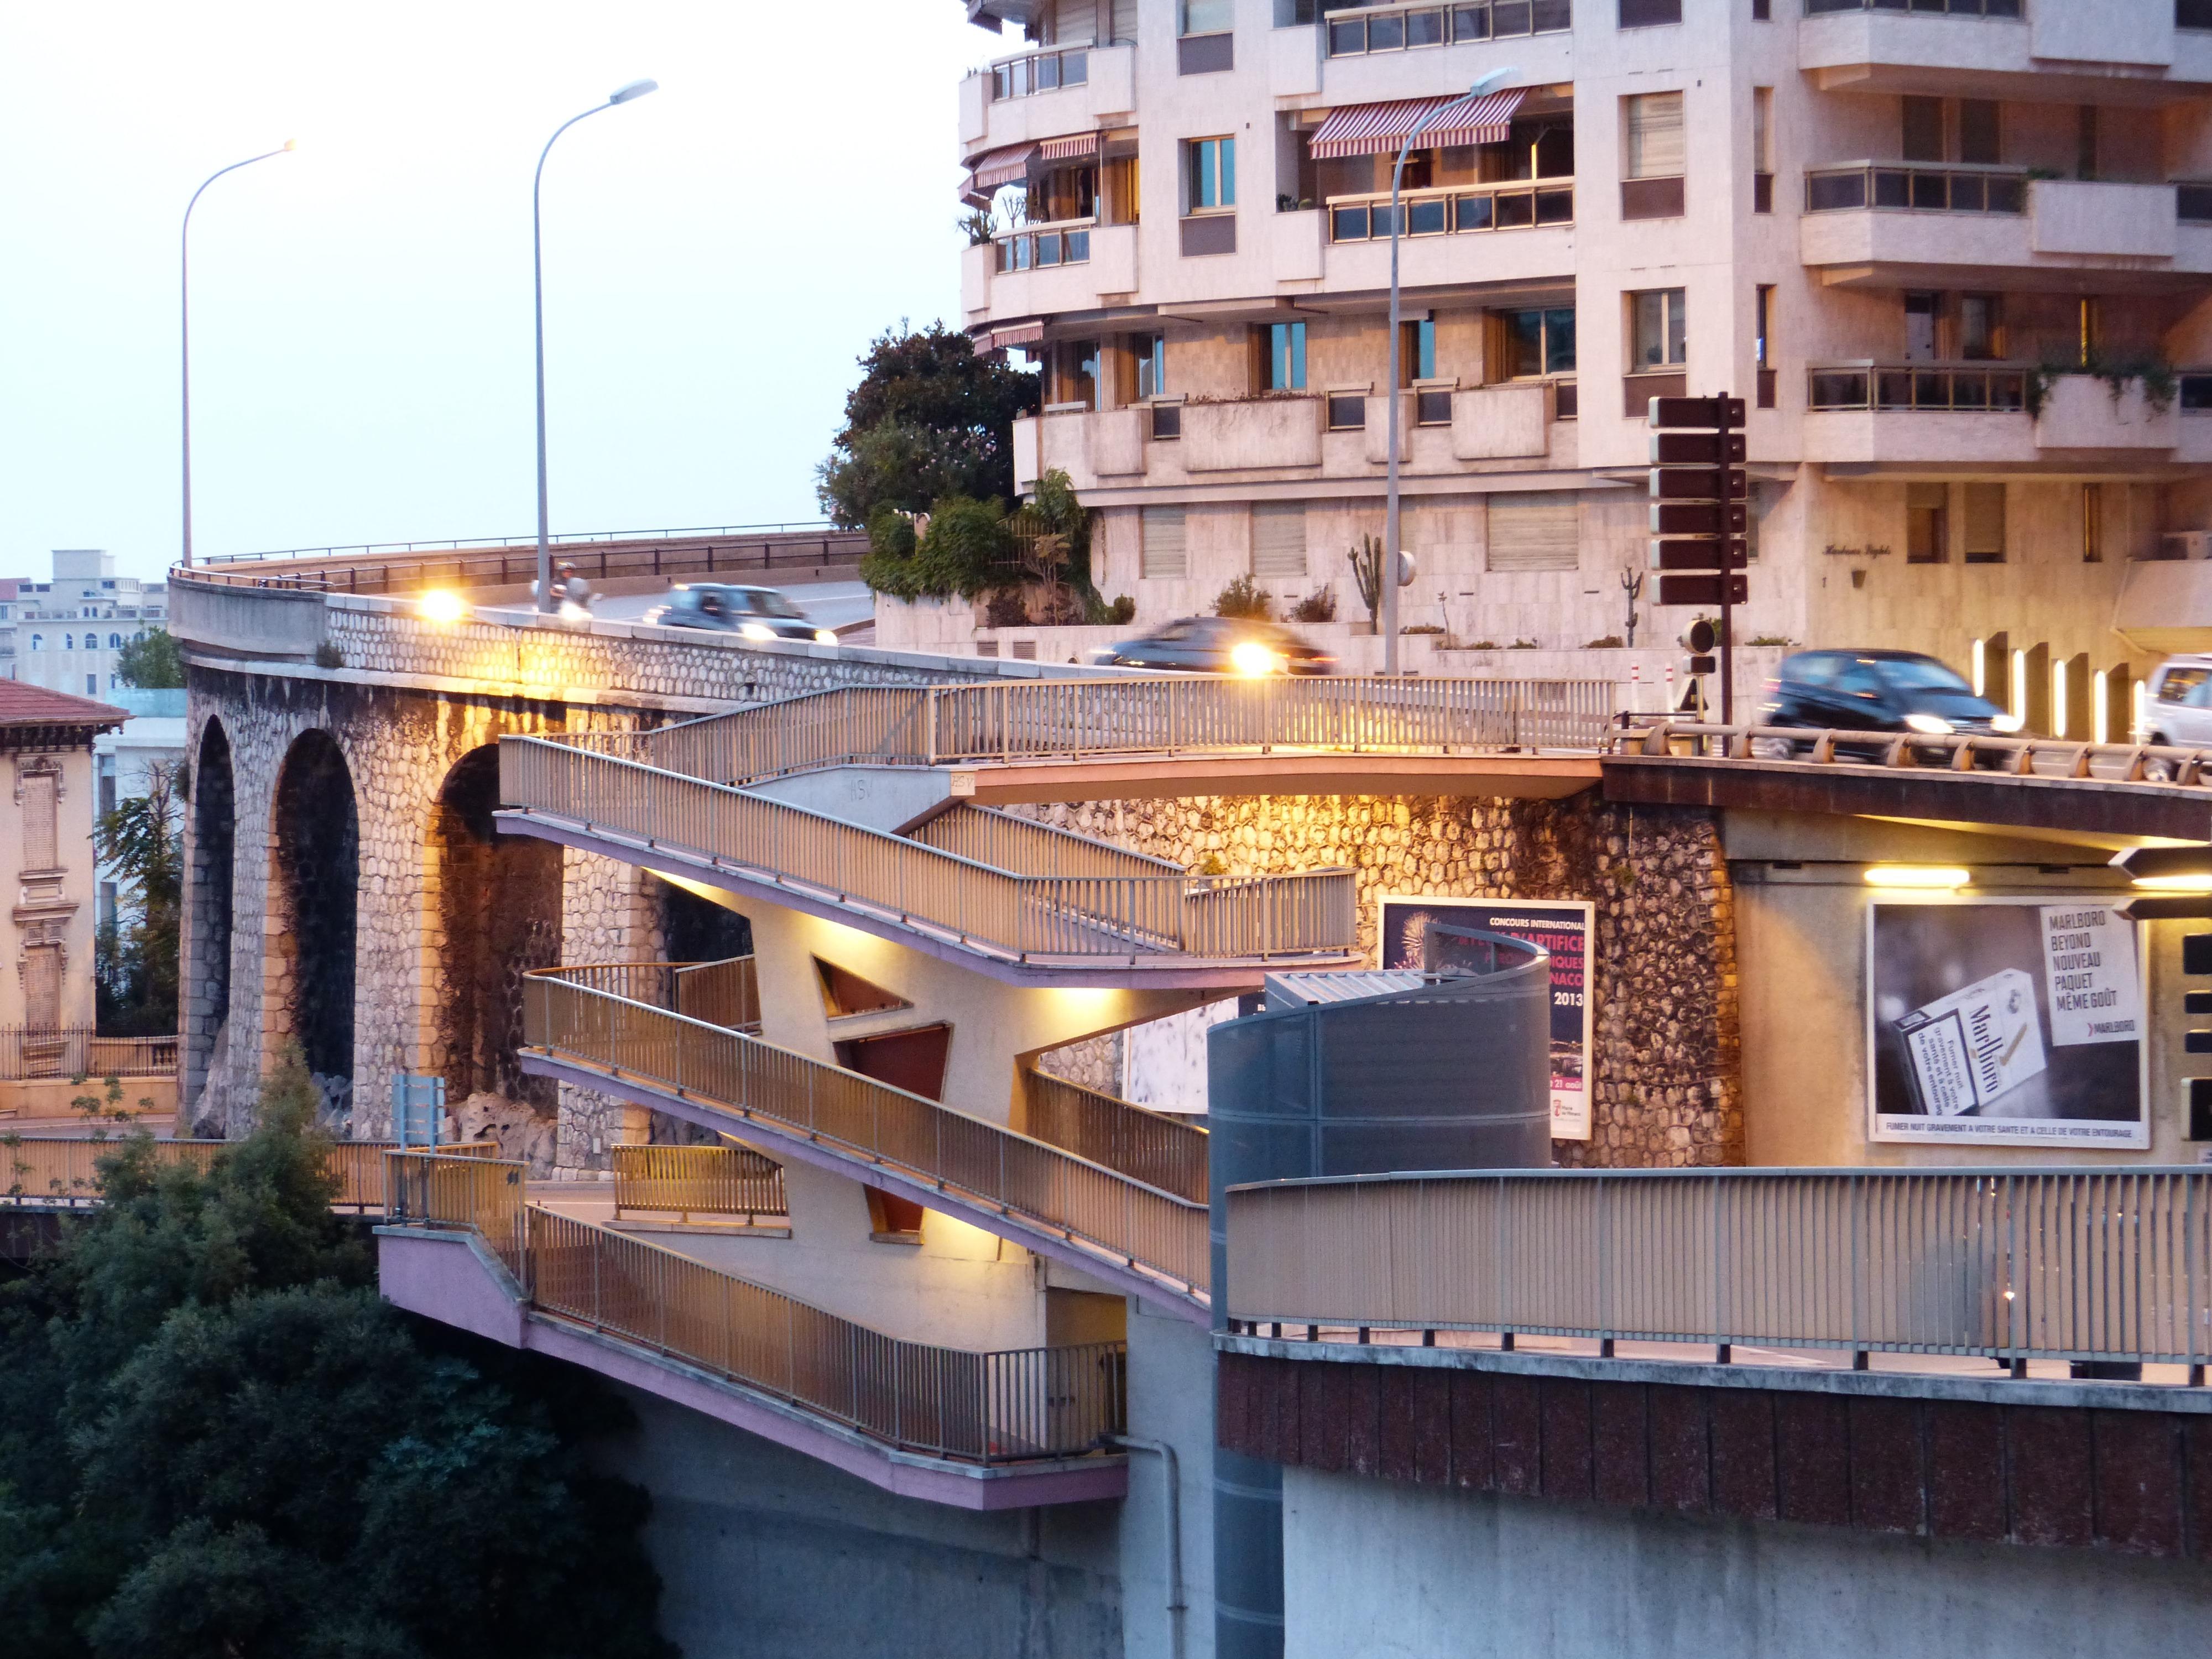 Gratis Afbeeldingen : voetganger, architectuur, weg, stad-, stad ...